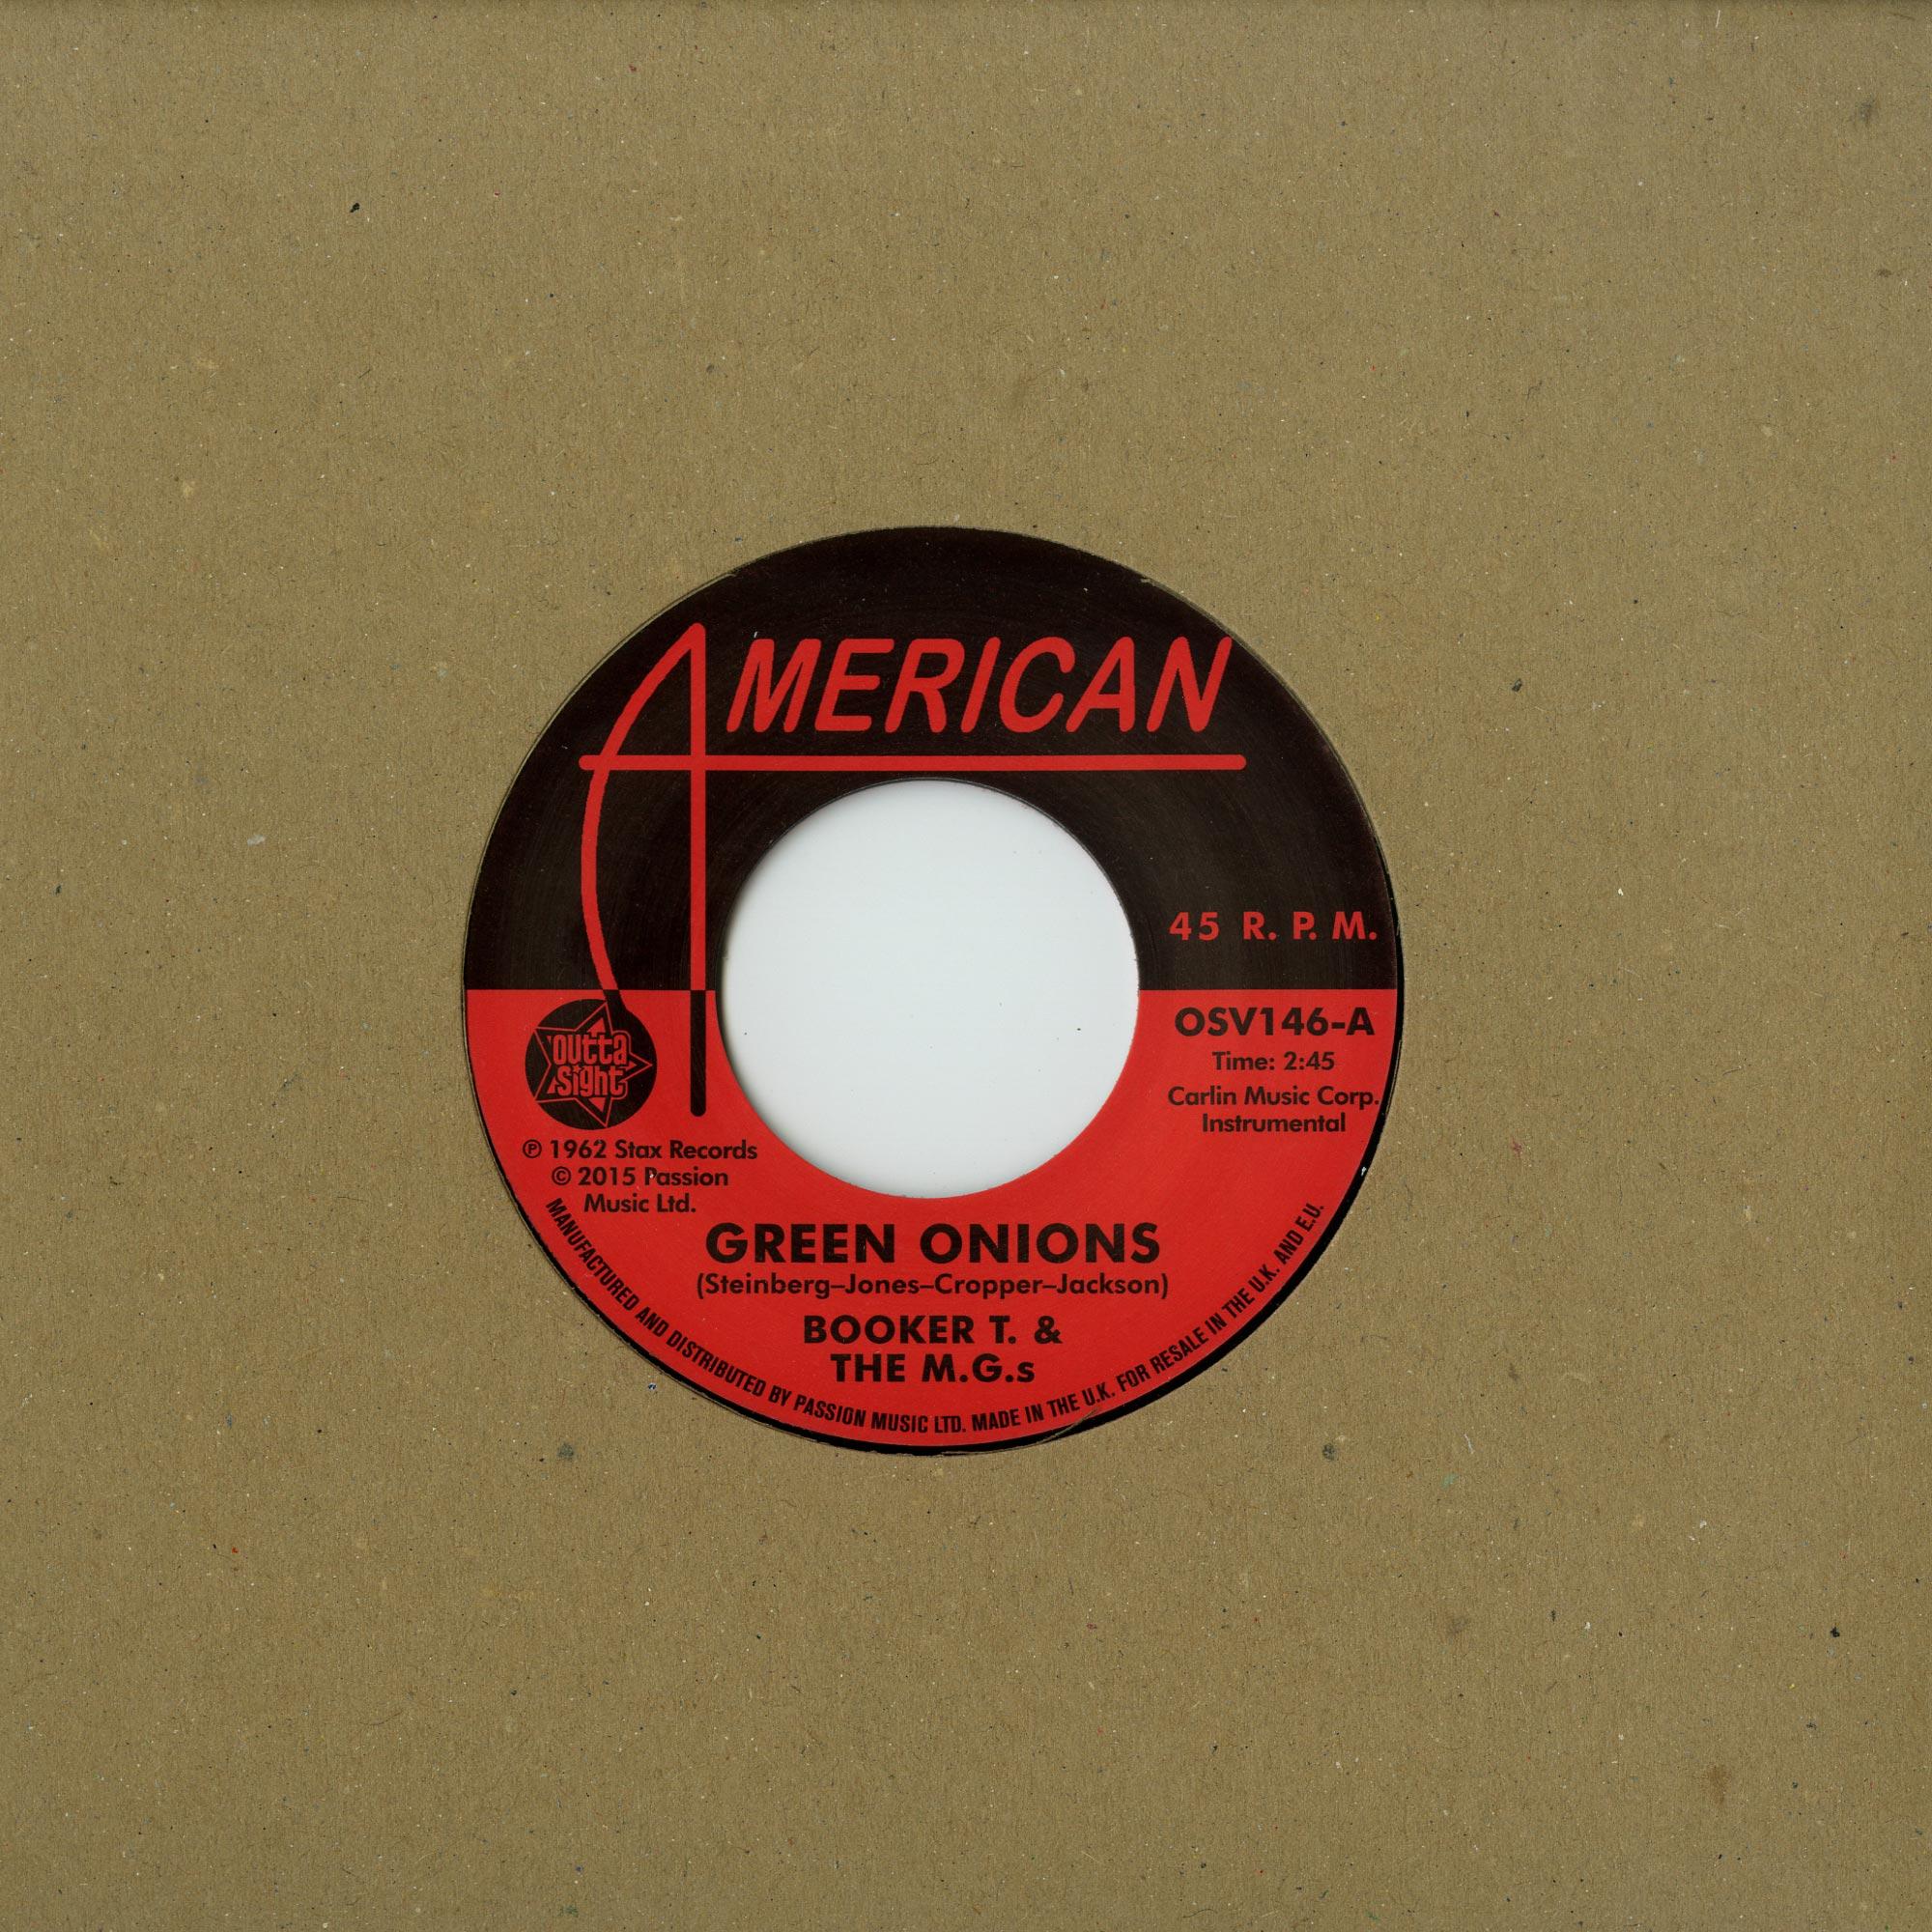 Booker T. & M.G.s / The Mar-Kets - GREEN ONIONS / BALBOA BLUE